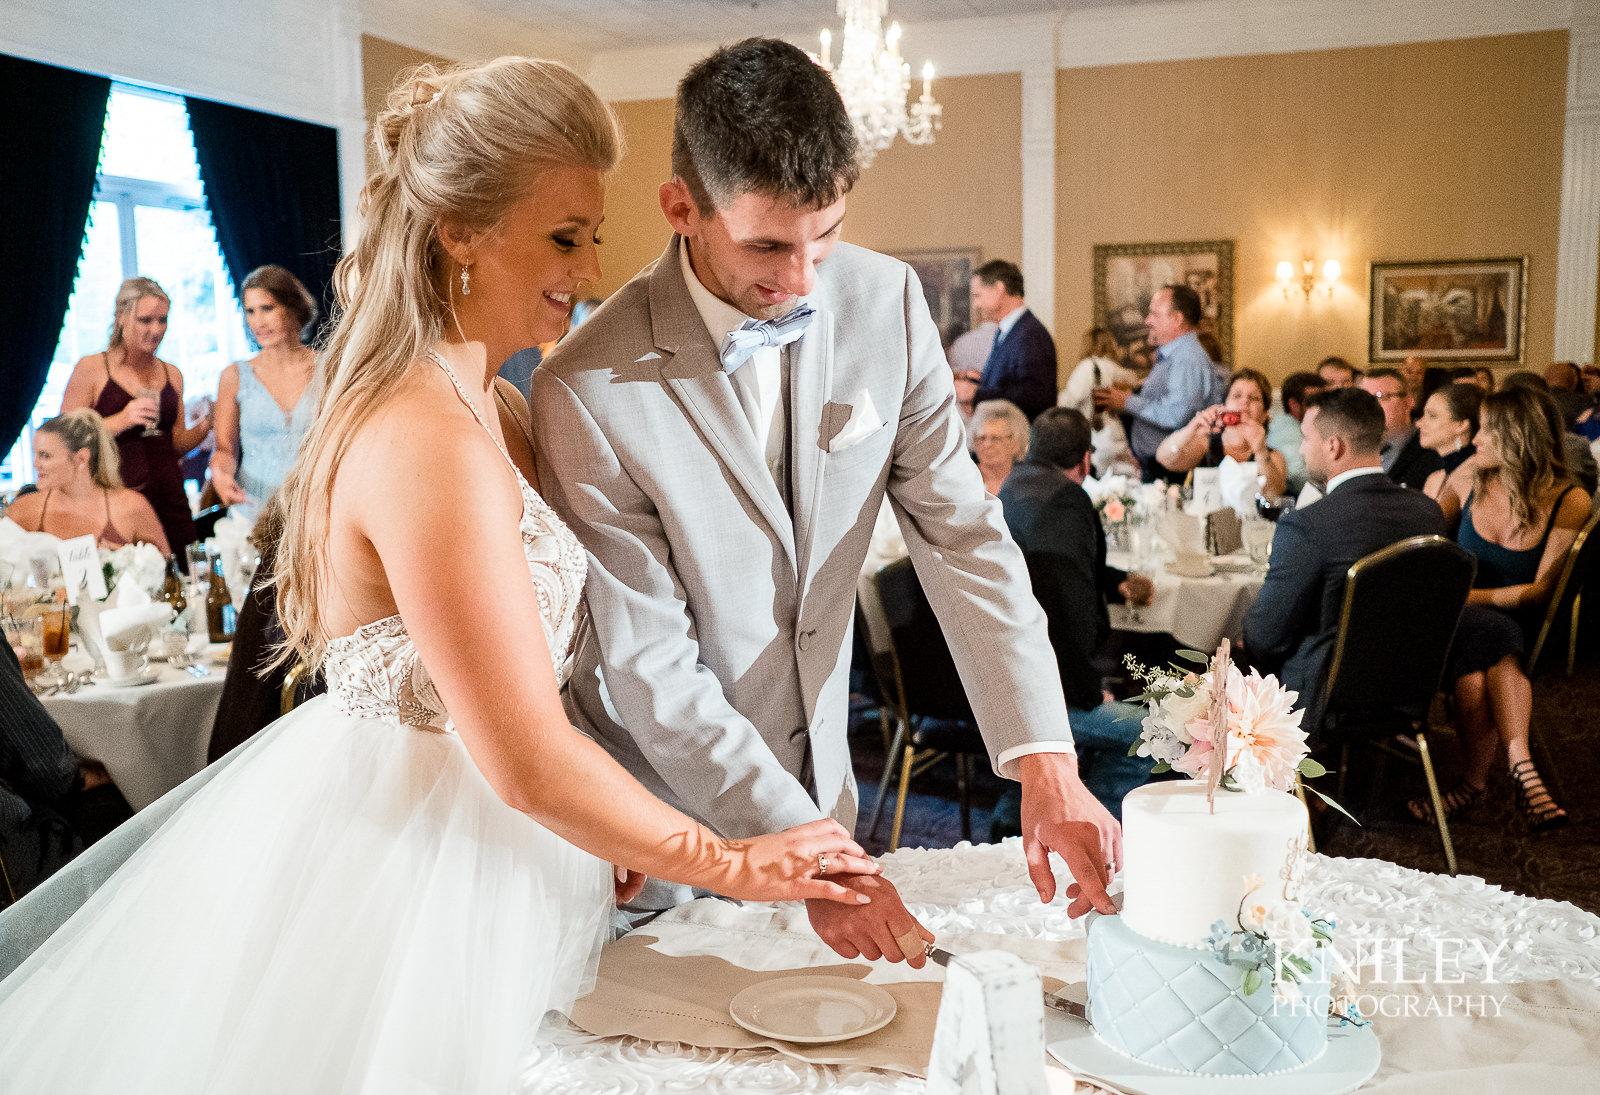 093 - Buffalo NY wedding pictures - Sean Patrick Restaurant Wedding Reception - Getzville - XT2B9407.jpg